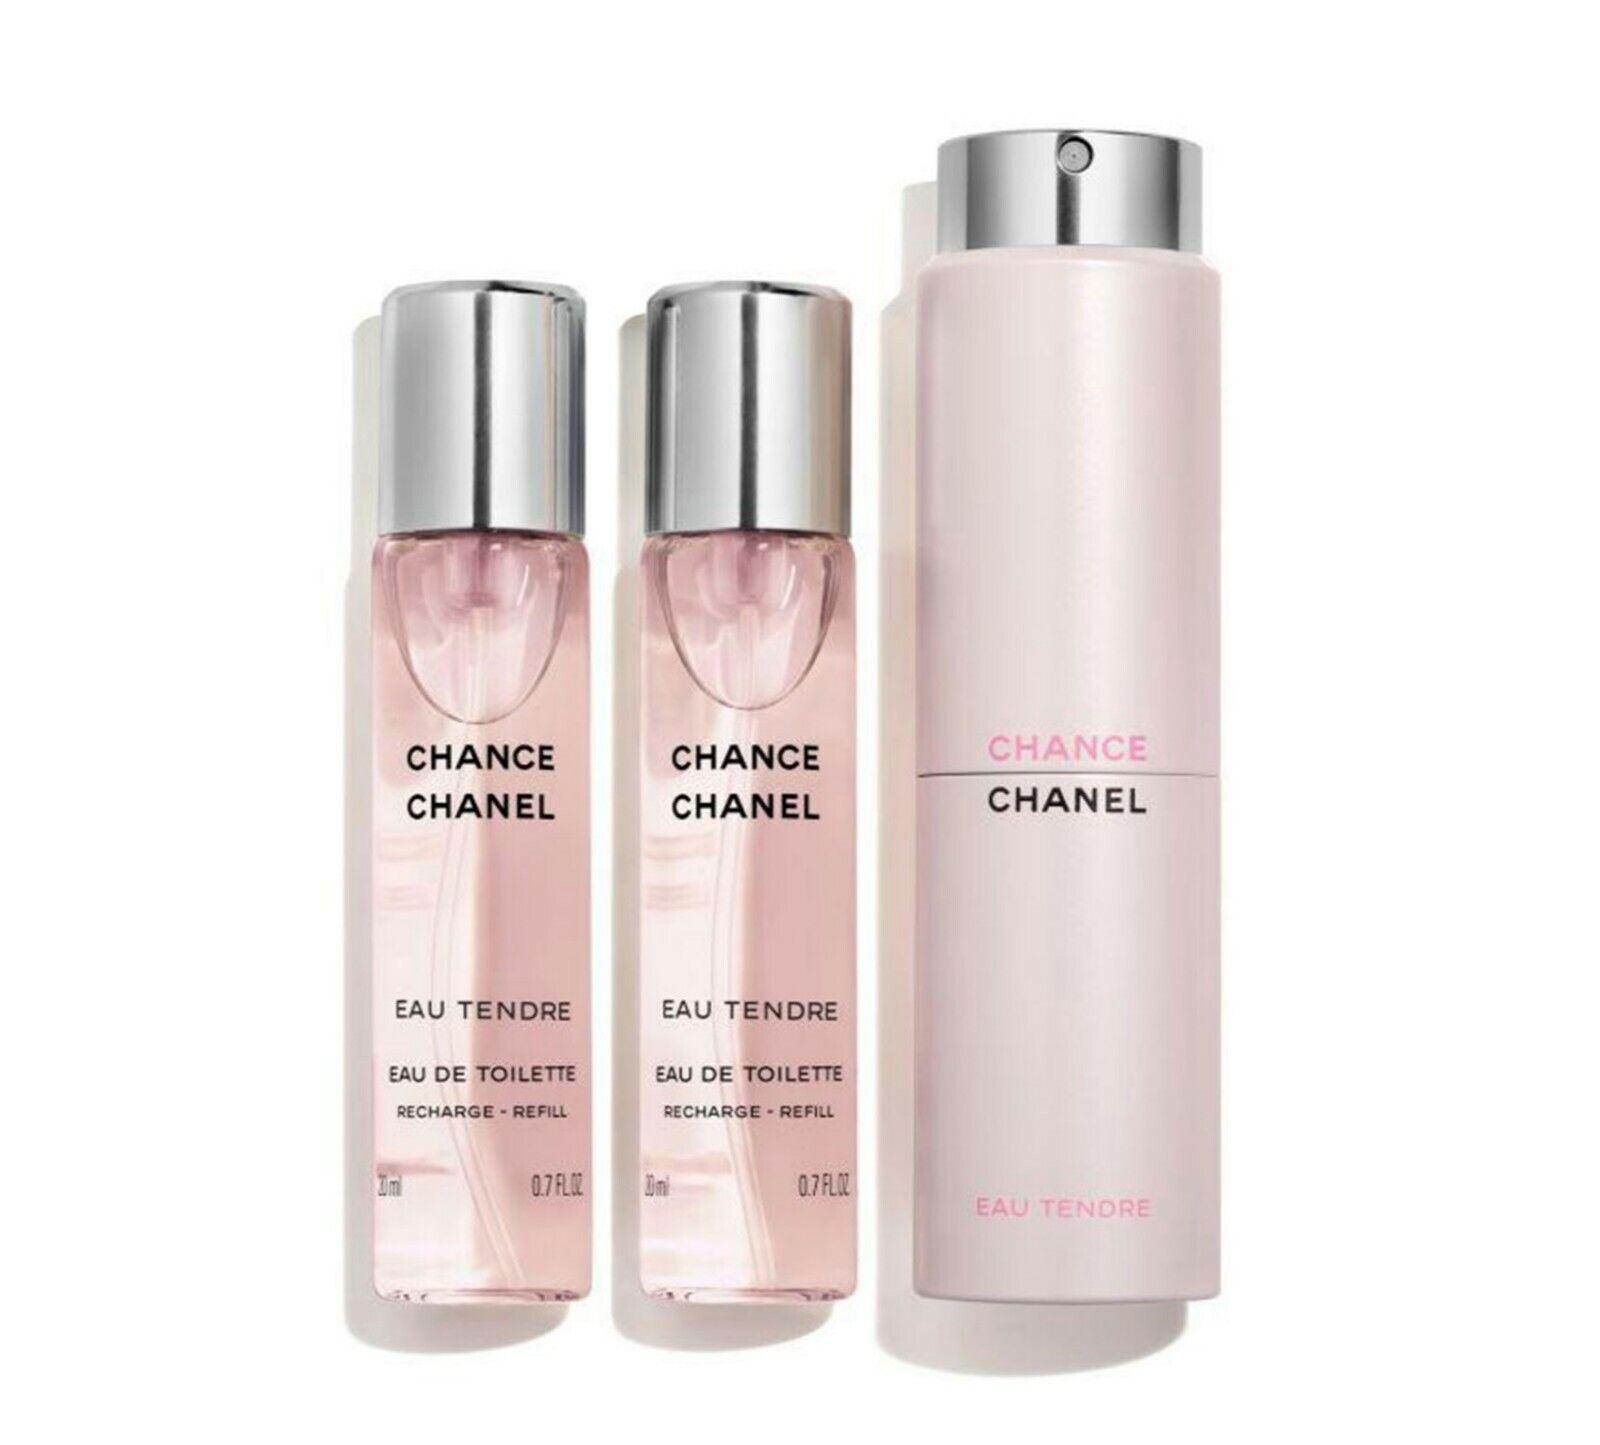 CHANEL CHANCE EAU TENDRE EDT Twist Purse Spray Travel Set Refills 3 X 07OZ